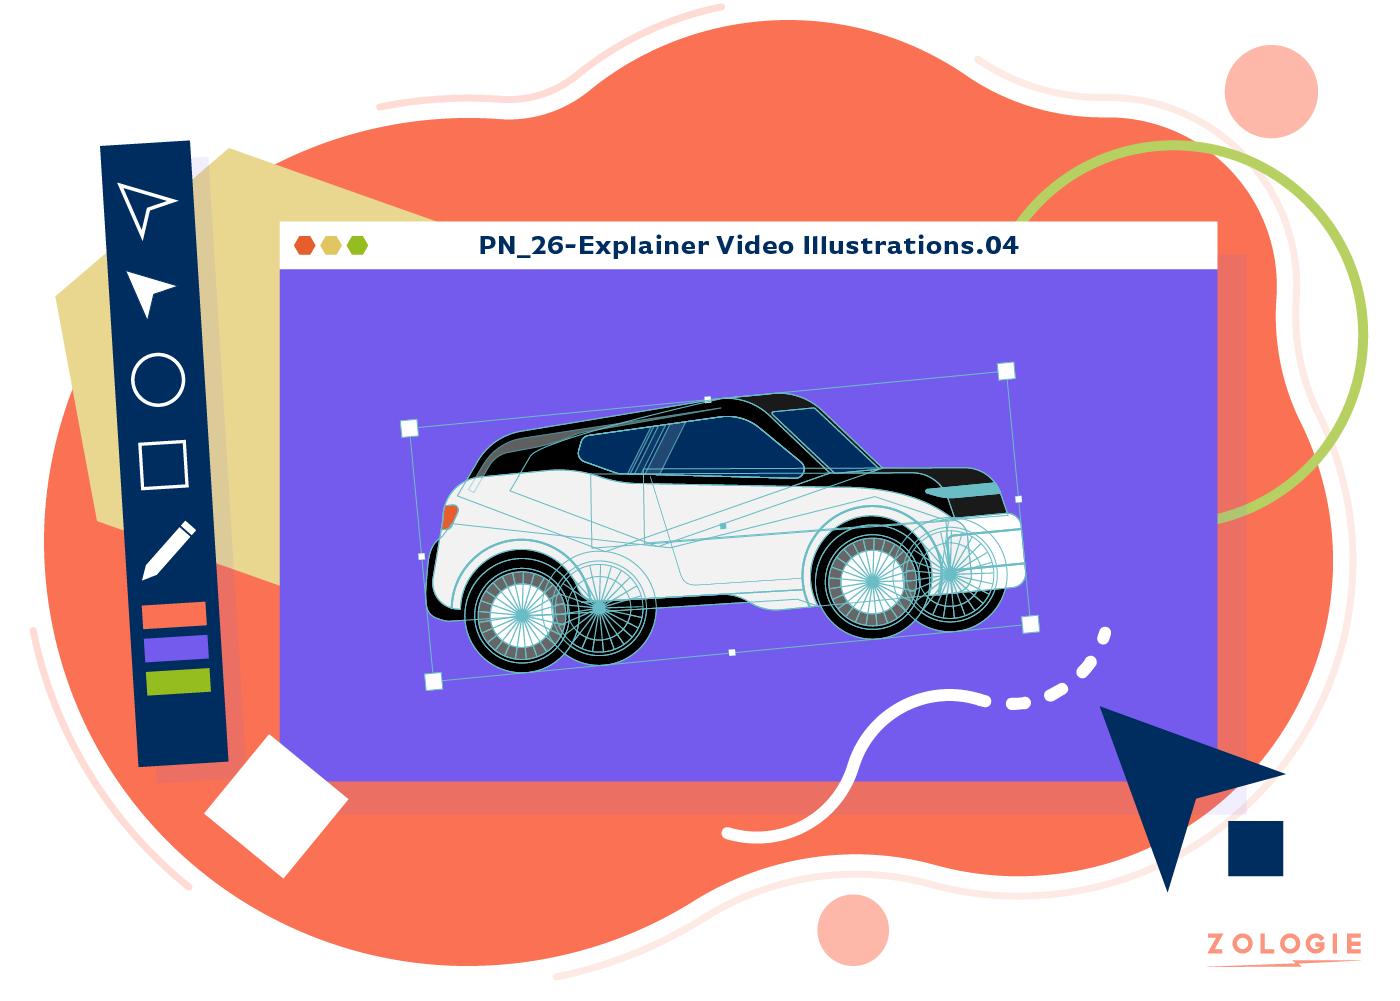 Explainer video illustrating in Adobe Illustrator